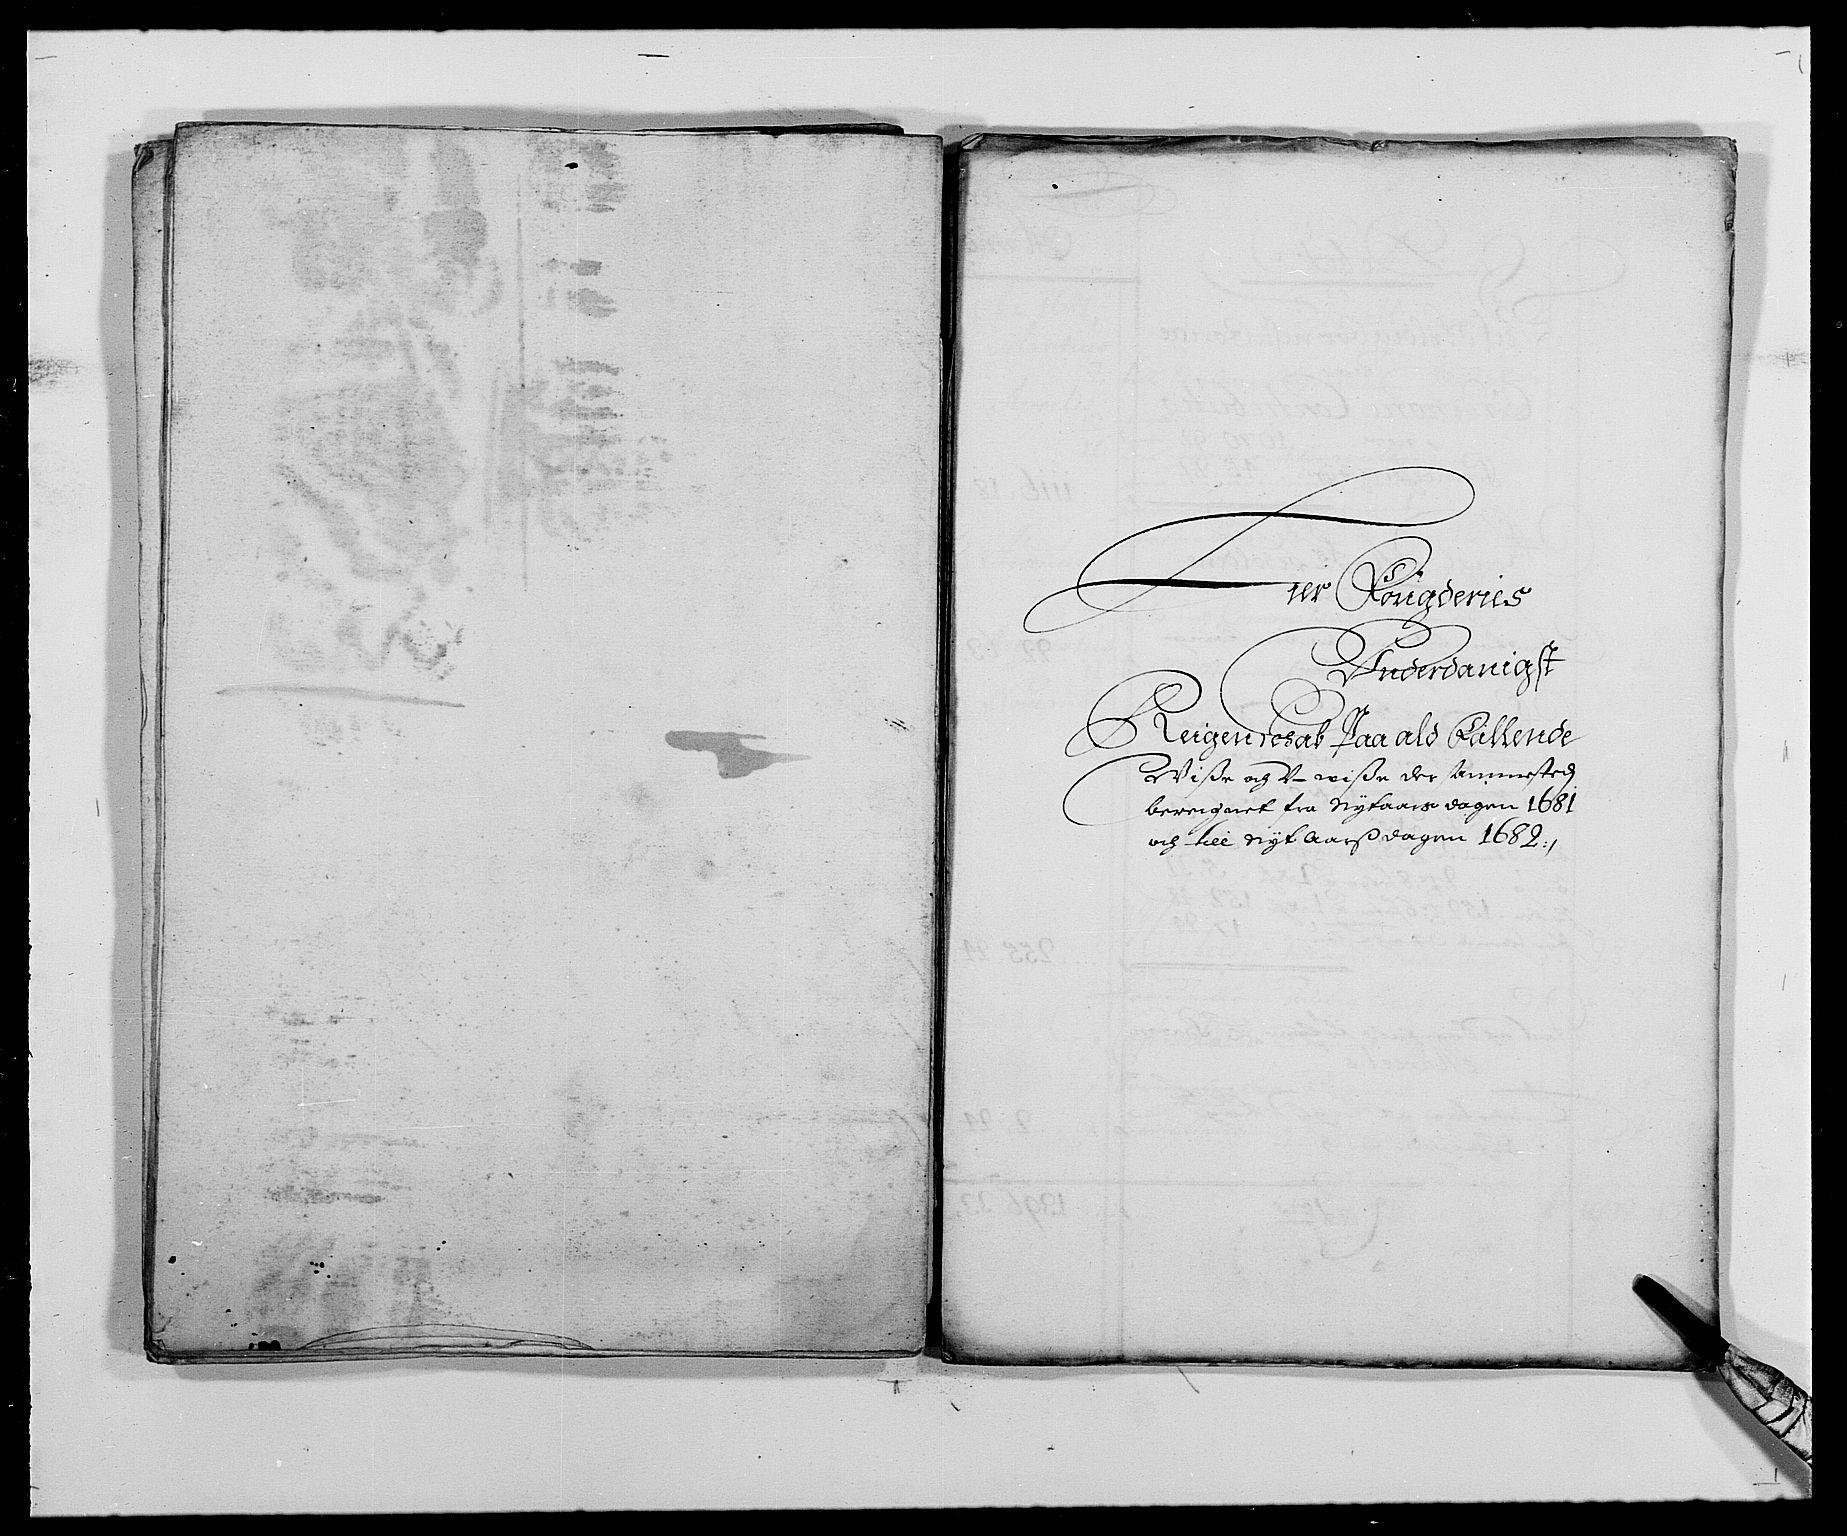 RA, Rentekammeret inntil 1814, Reviderte regnskaper, Fogderegnskap, R27/L1687: Fogderegnskap Lier, 1678-1686, s. 311